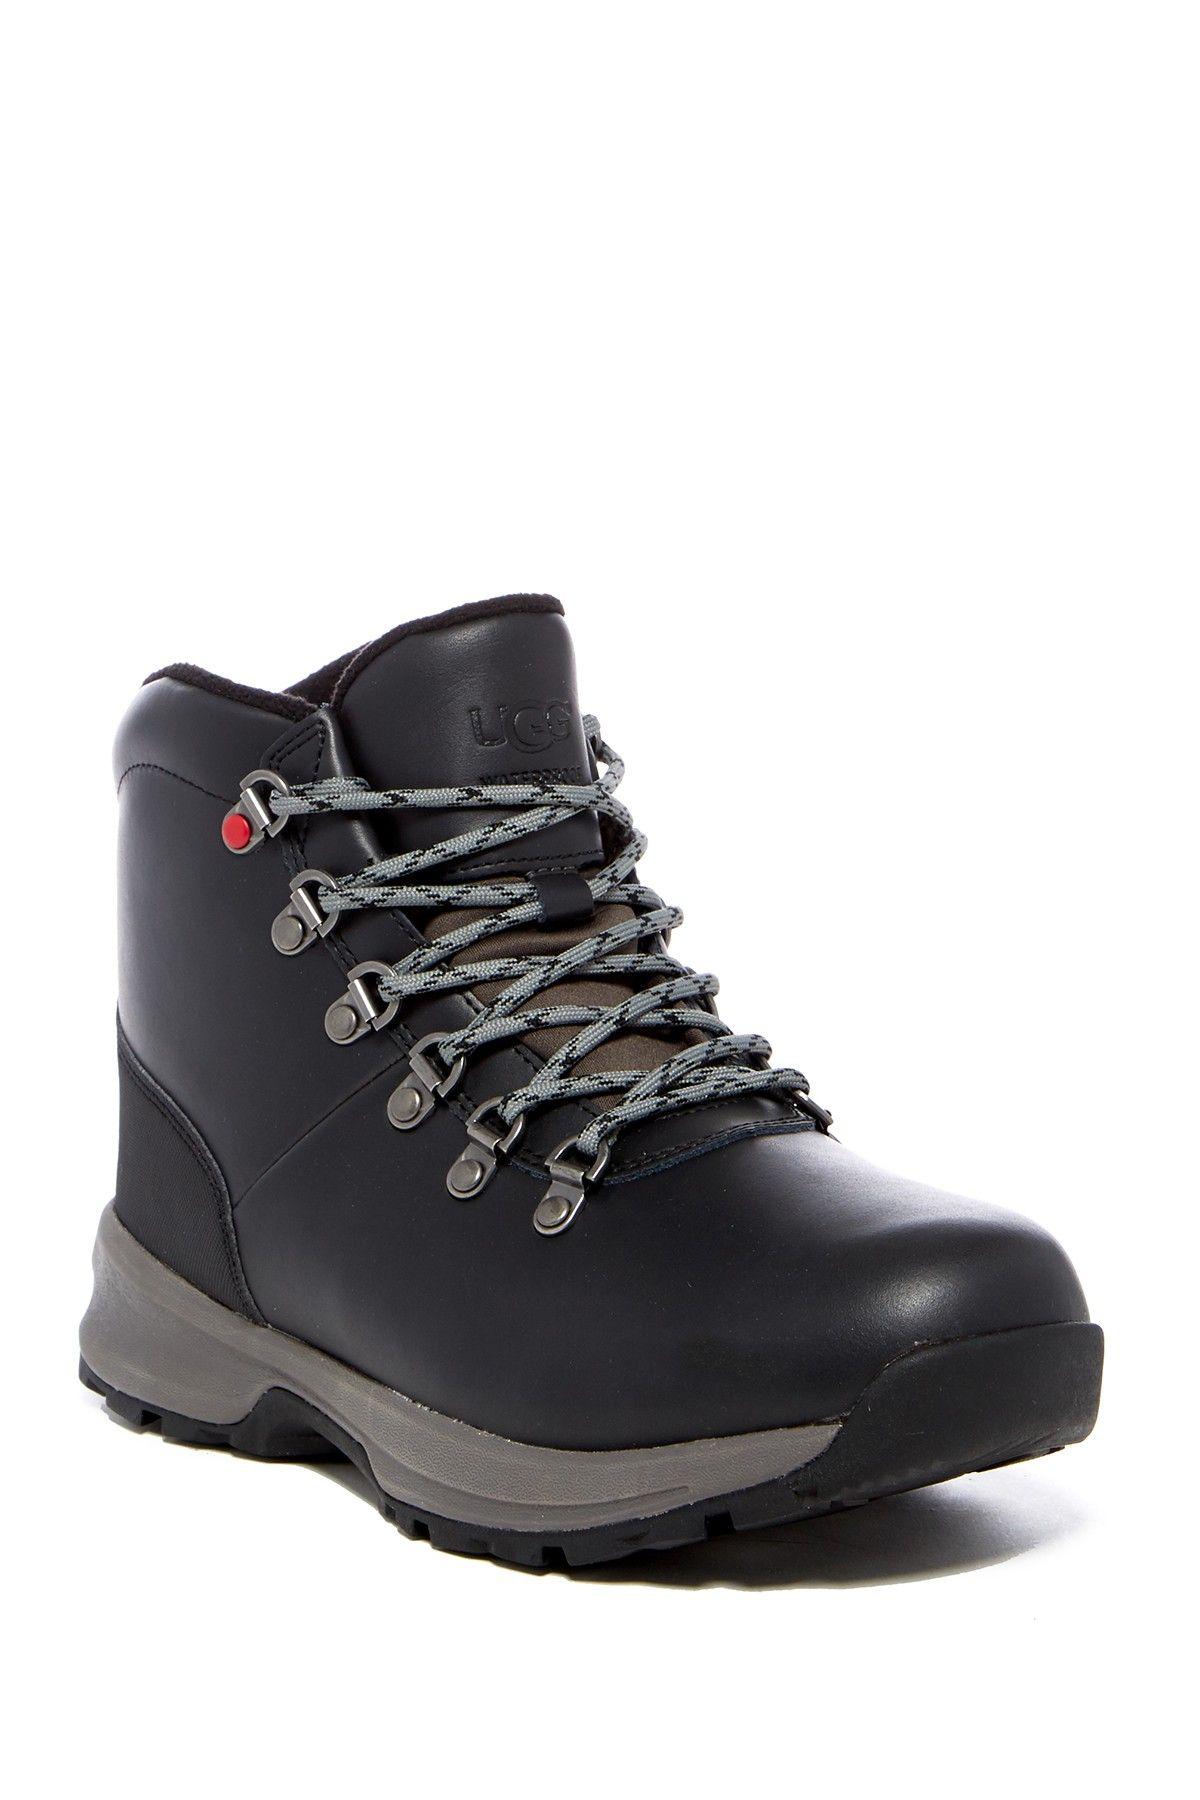 353a30e5e53 Holmar UGGpure™ Lined Waterproof Rain Boot Rain Boots